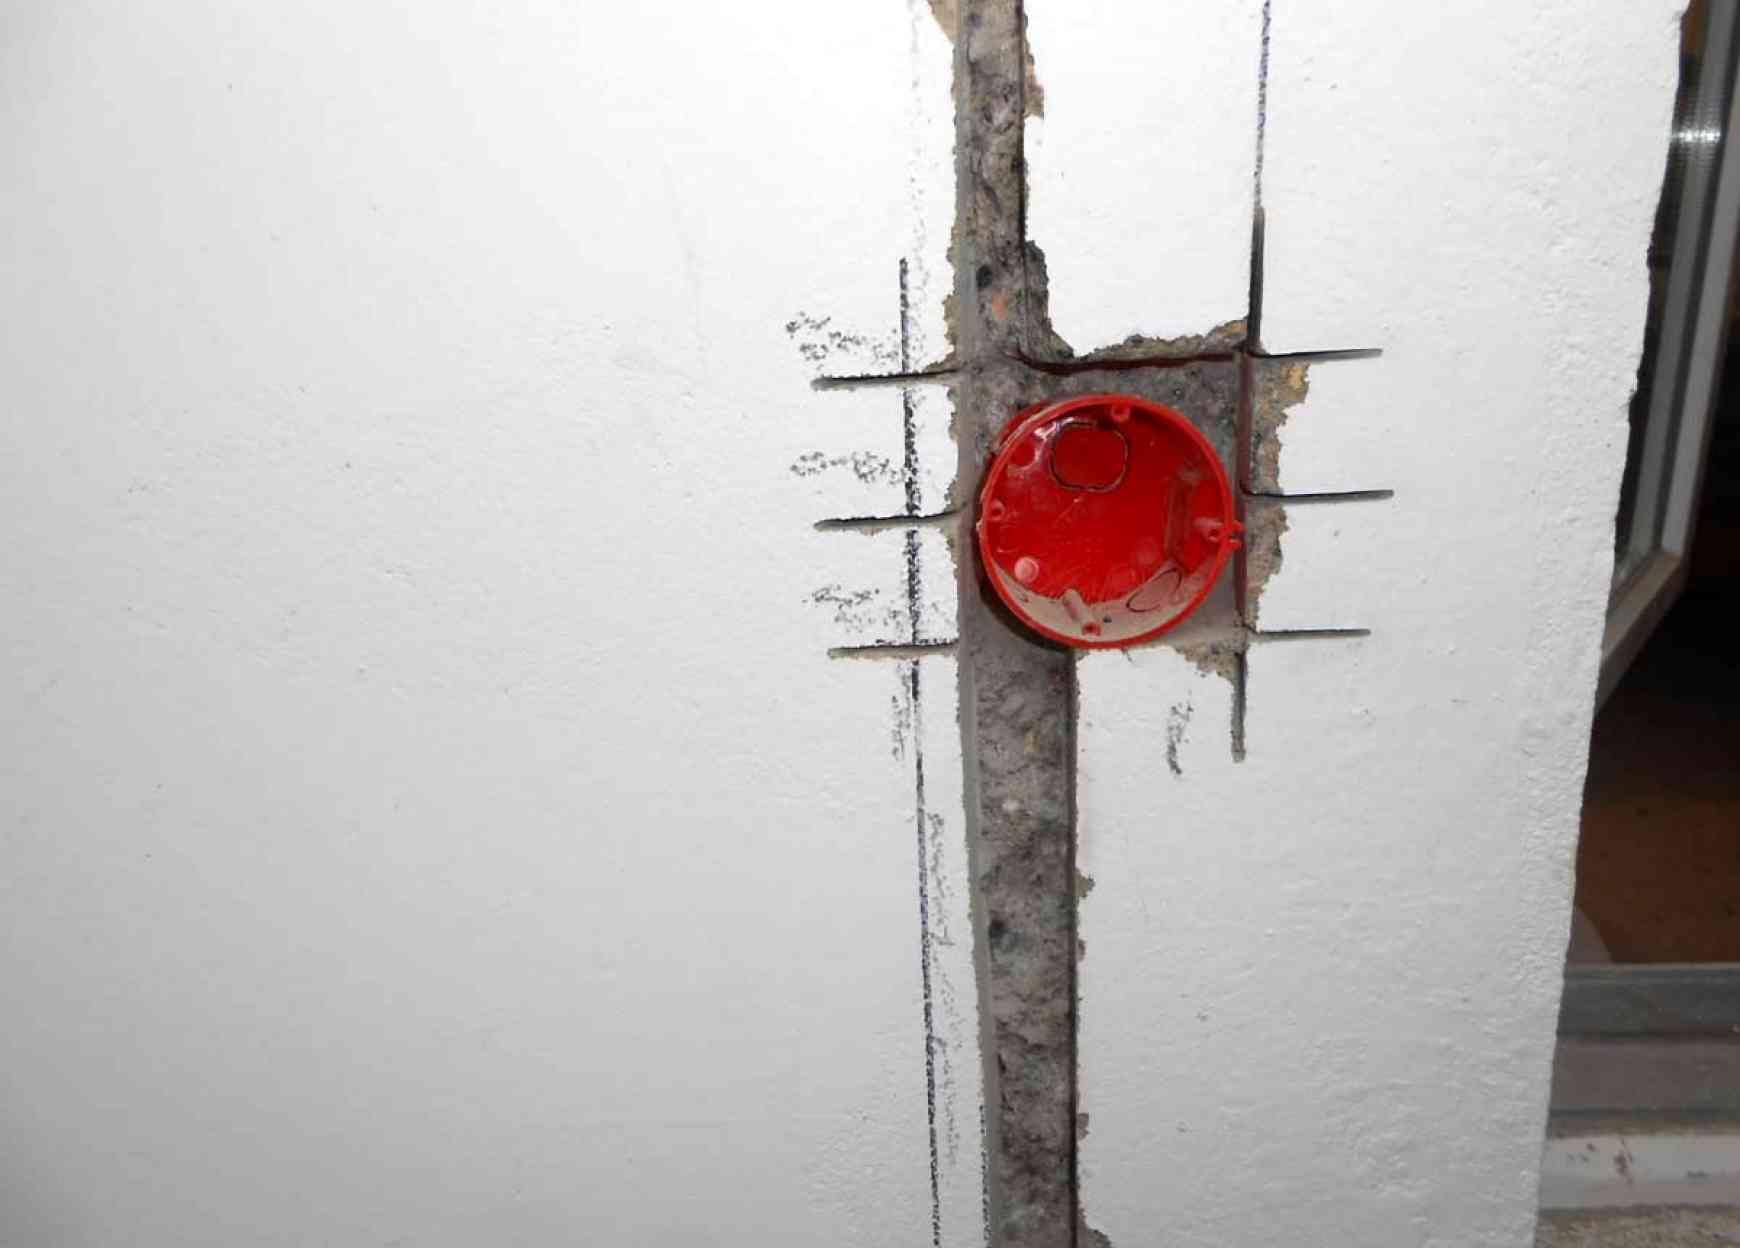 Установка подрозетника в бетонной стене